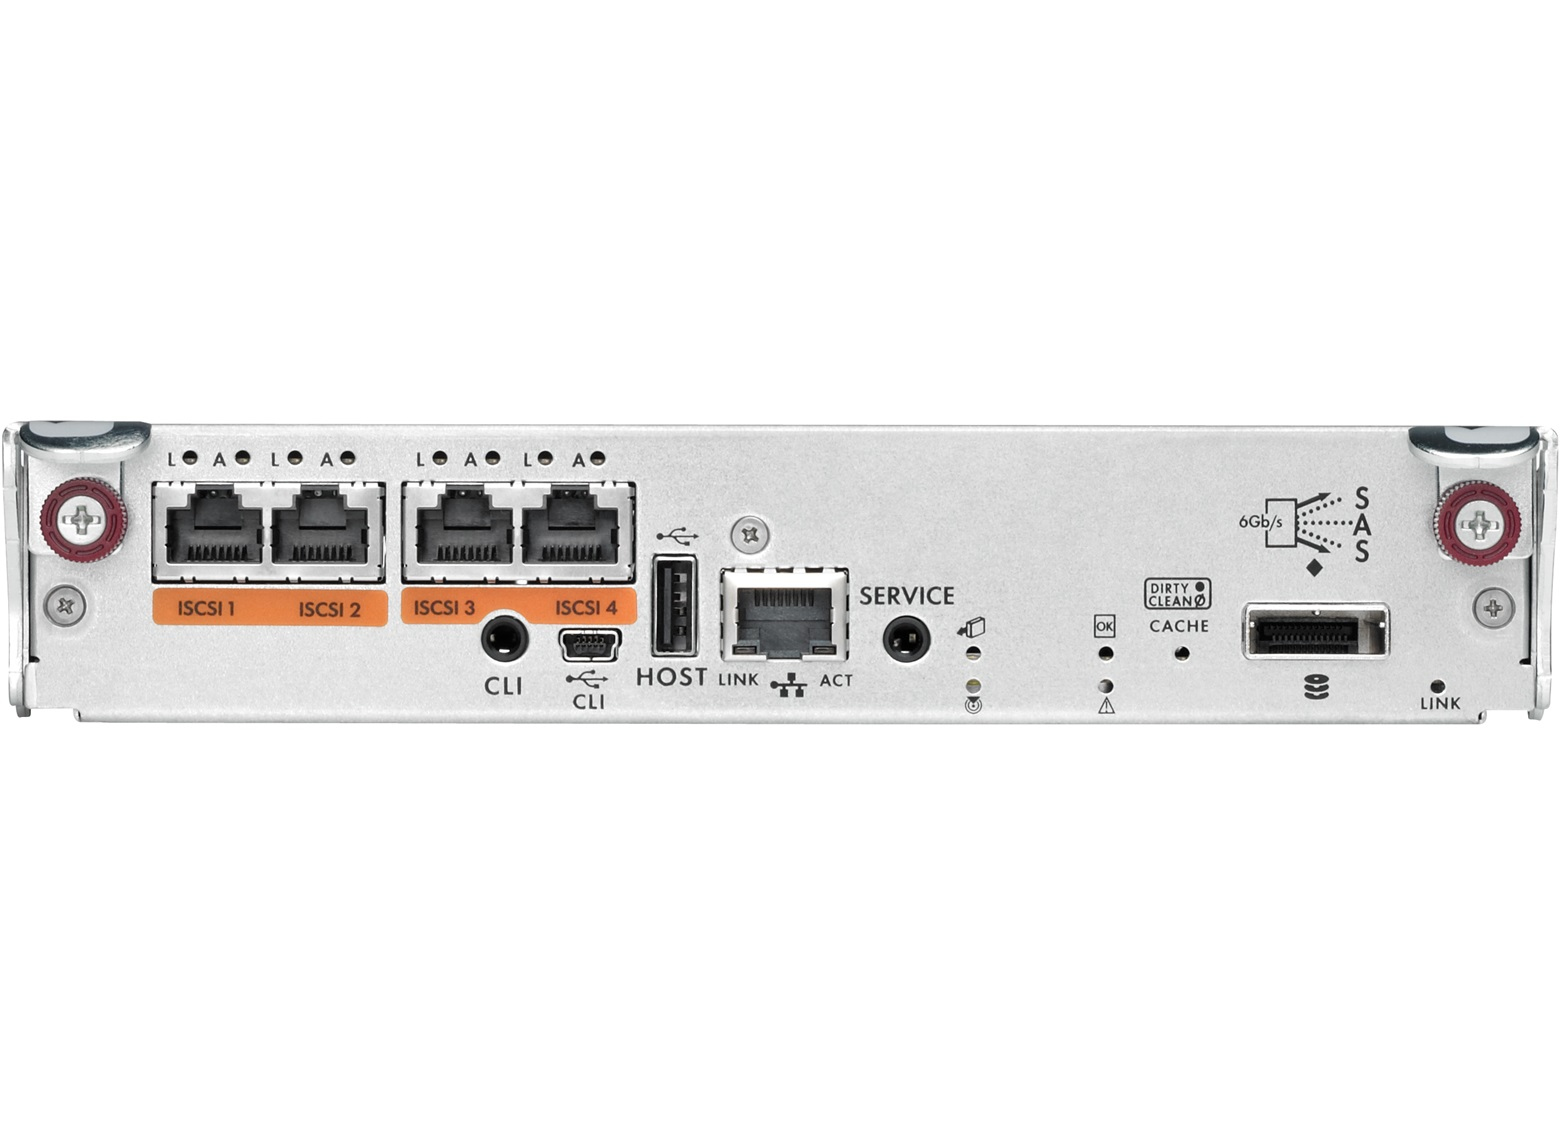 HP P2000 G3 iSCSI MSA Controller (BK829B) - REFURB